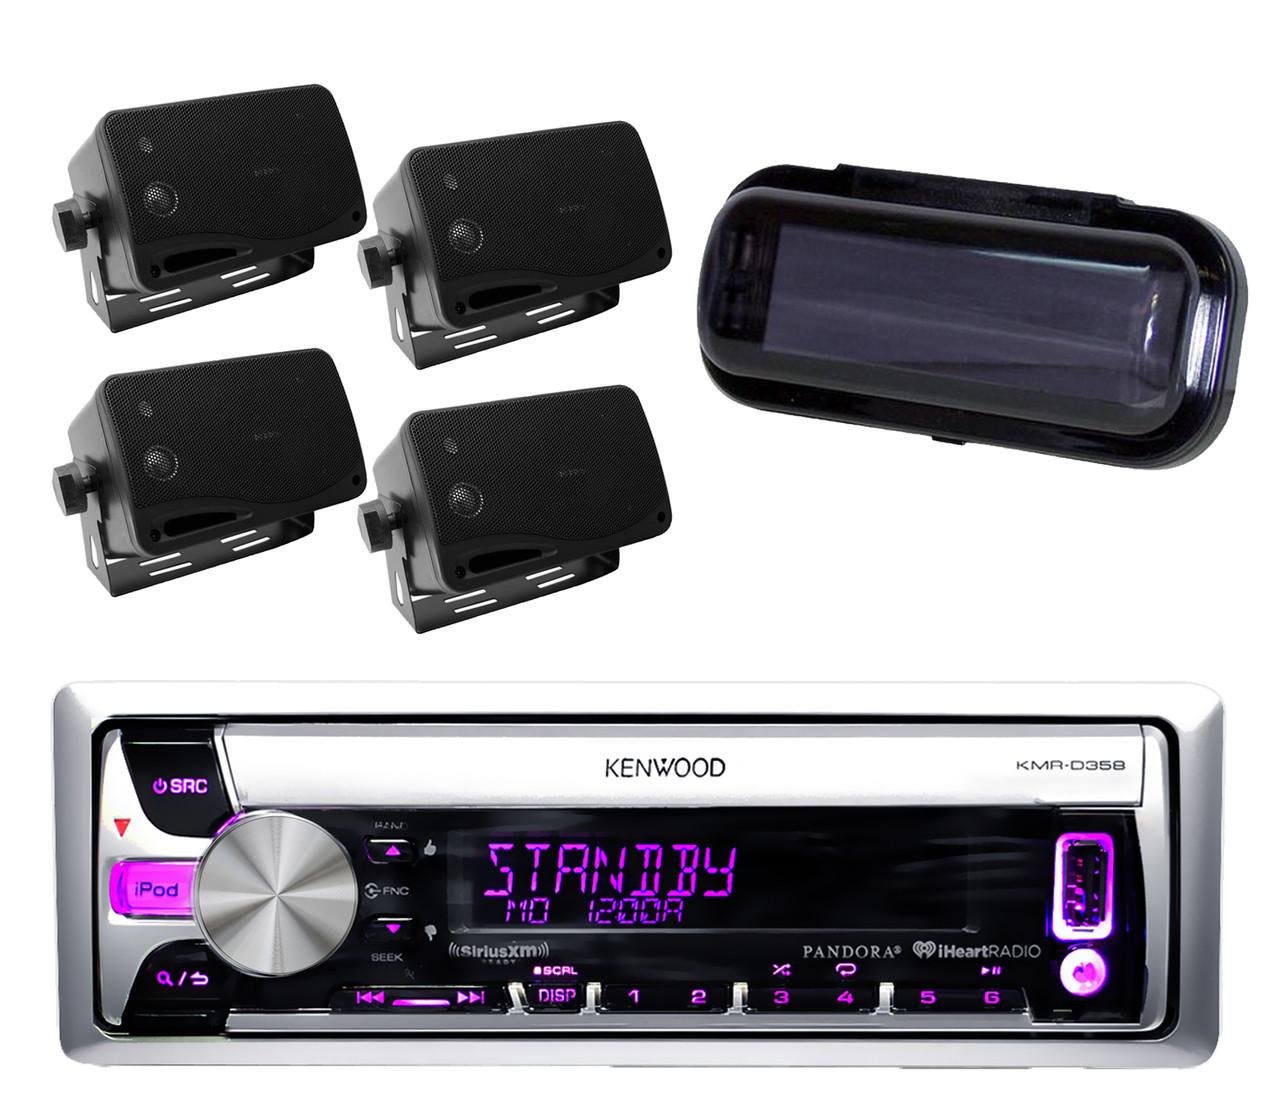 hight resolution of kenwood new kmr d358 iphone ipod pandora radio player 4 black box speakers